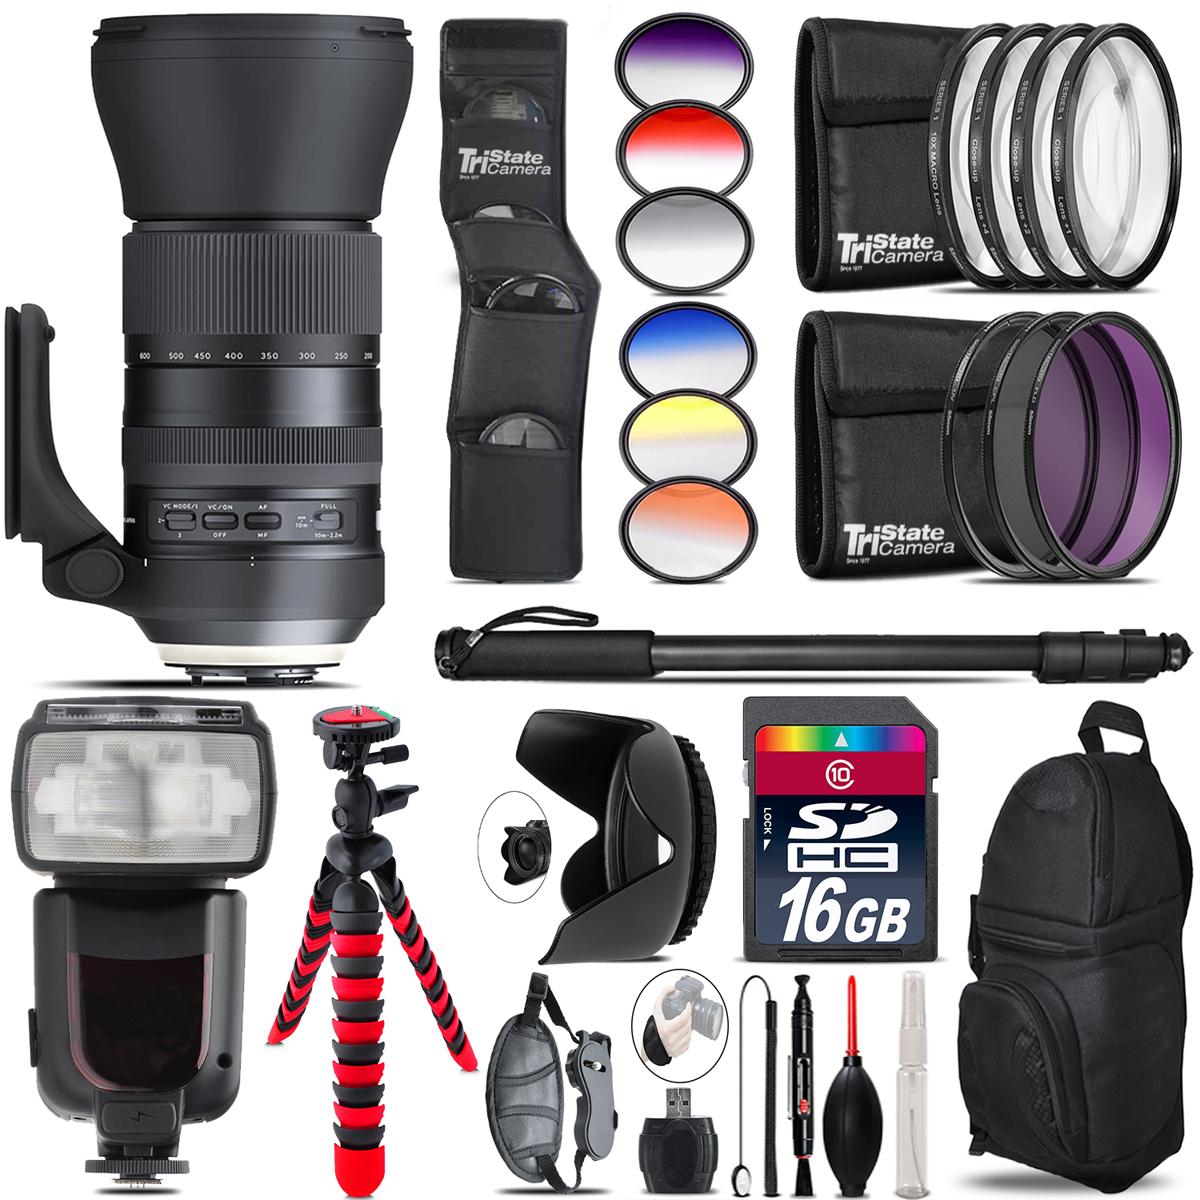 Tamron 150-600mm G2 for Nikon + Pro Flash + Filter Kit - 16GB Accessory Kit *FREE SHIPPING*